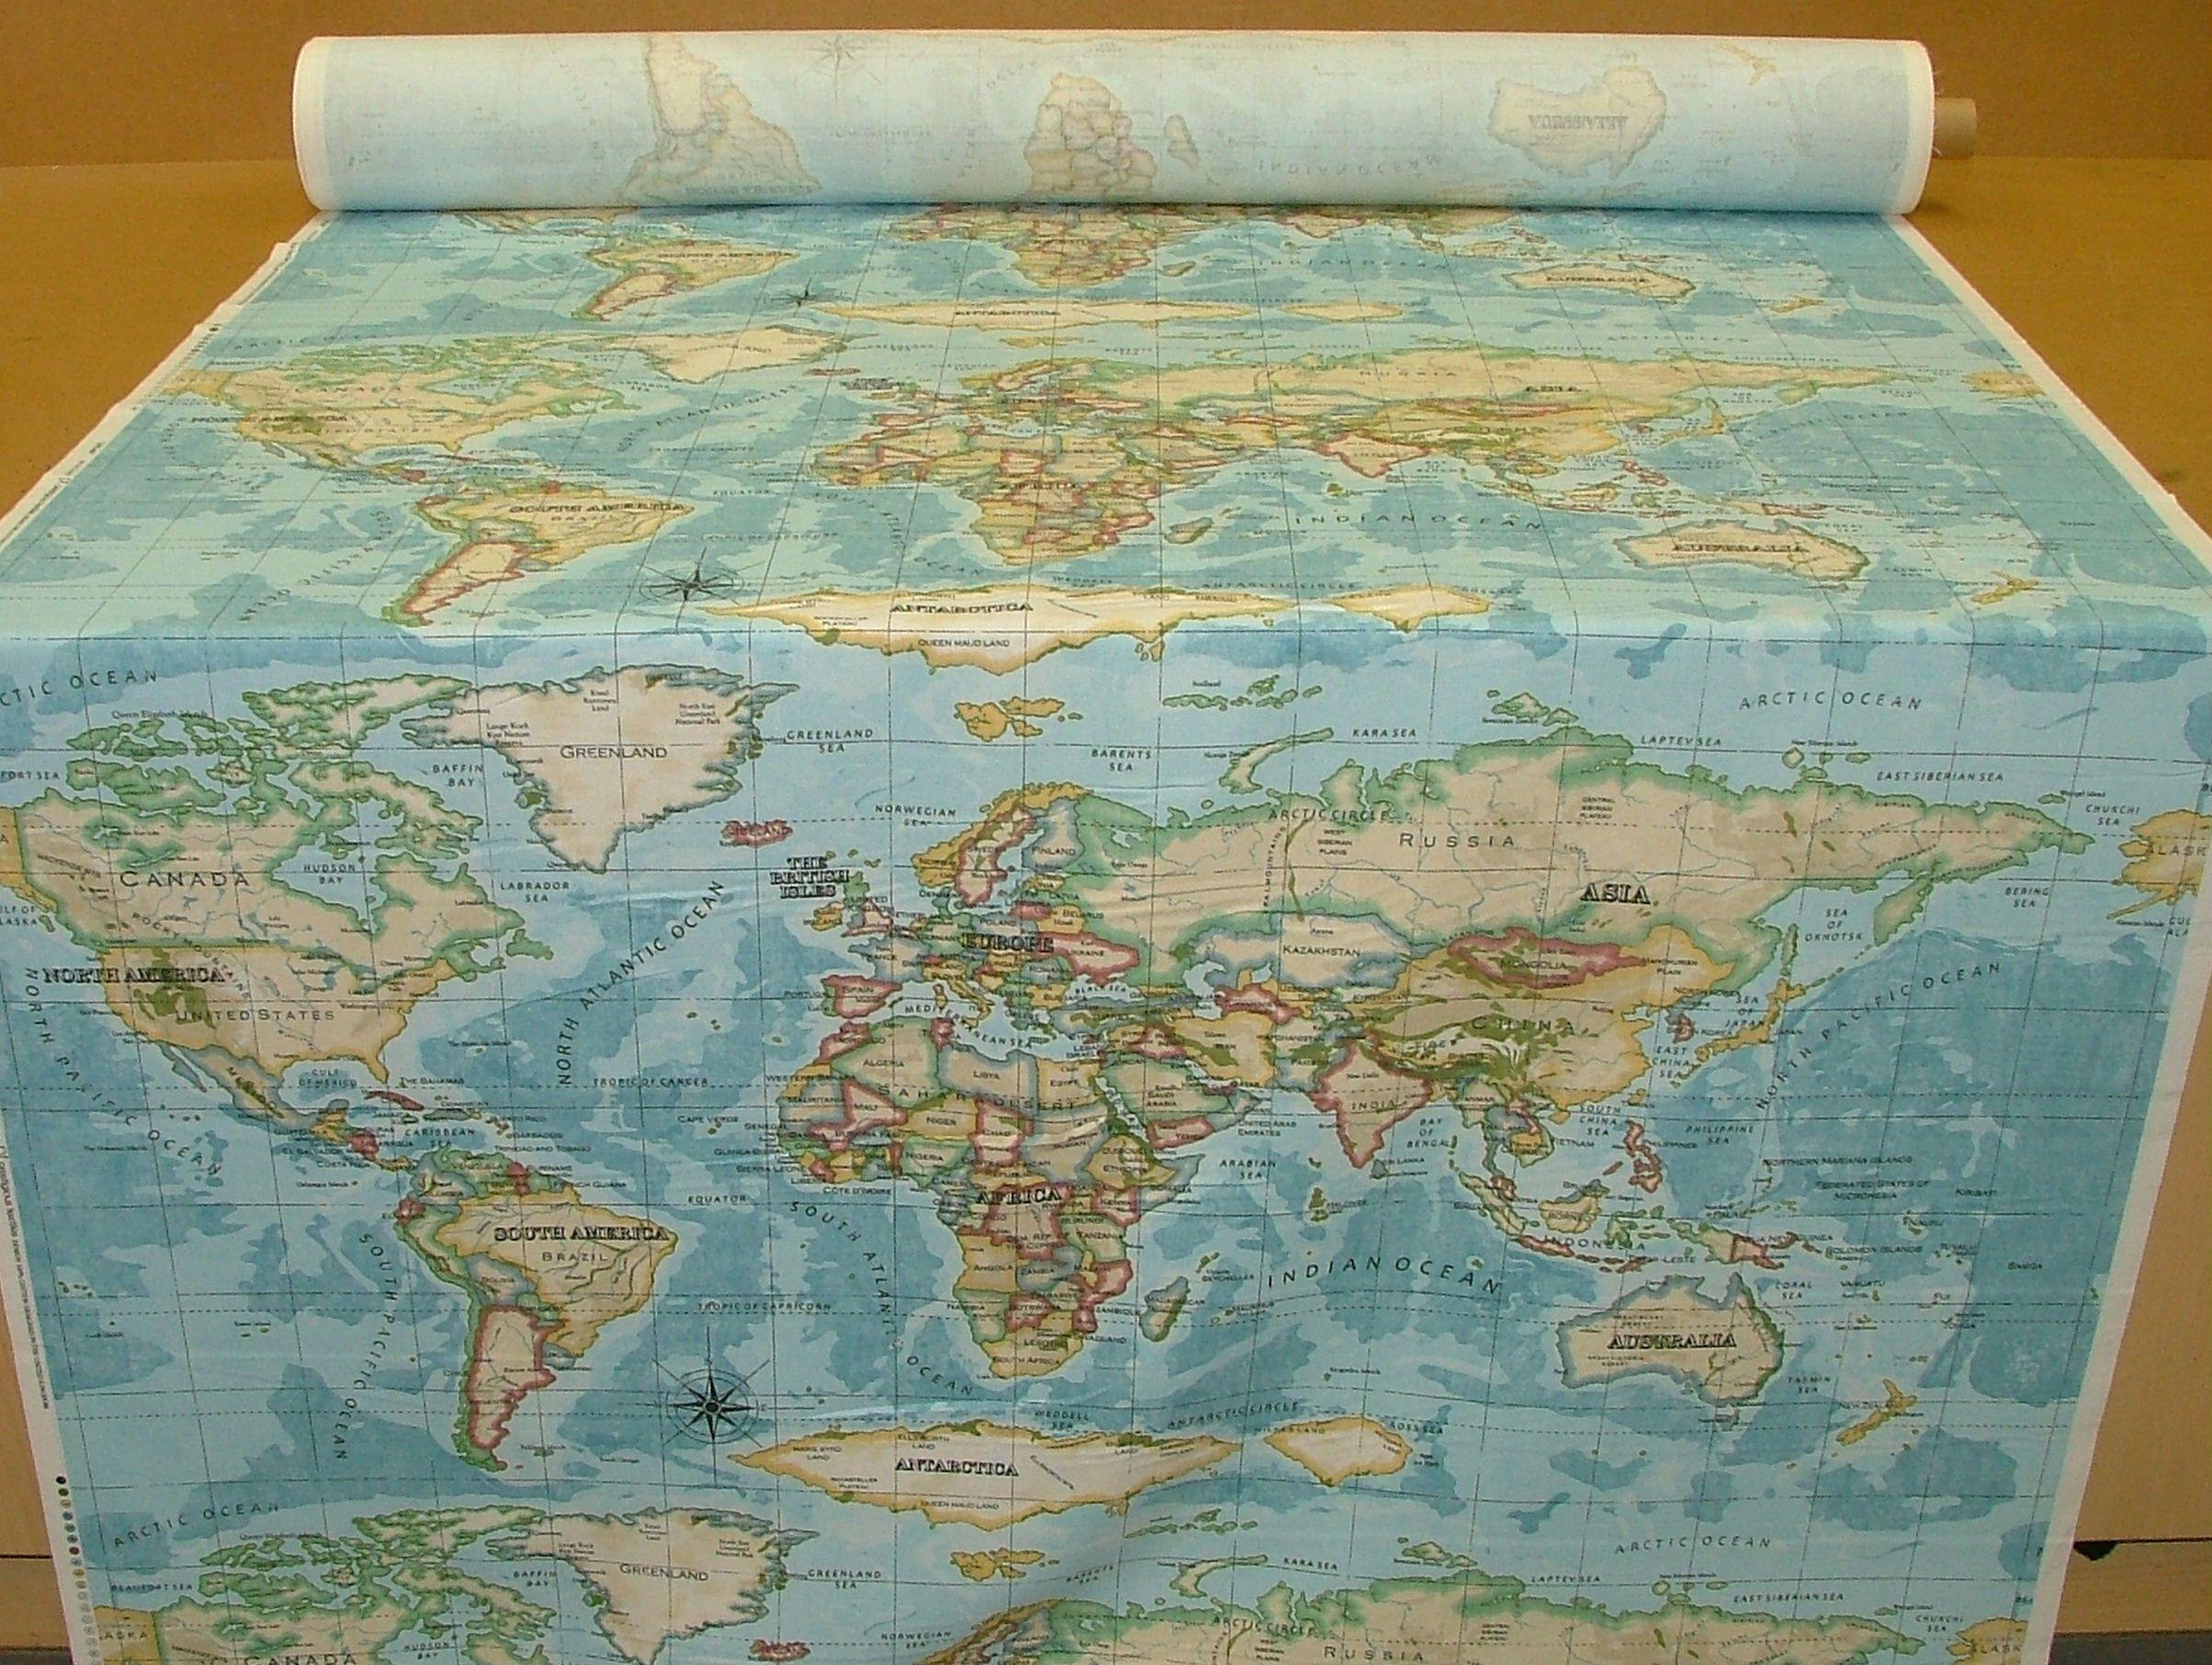 World map upholstry range prestigious atlas world map azure world map upholstry range prestigious atlas world map azure prestigious designer fabric gumiabroncs Choice Image